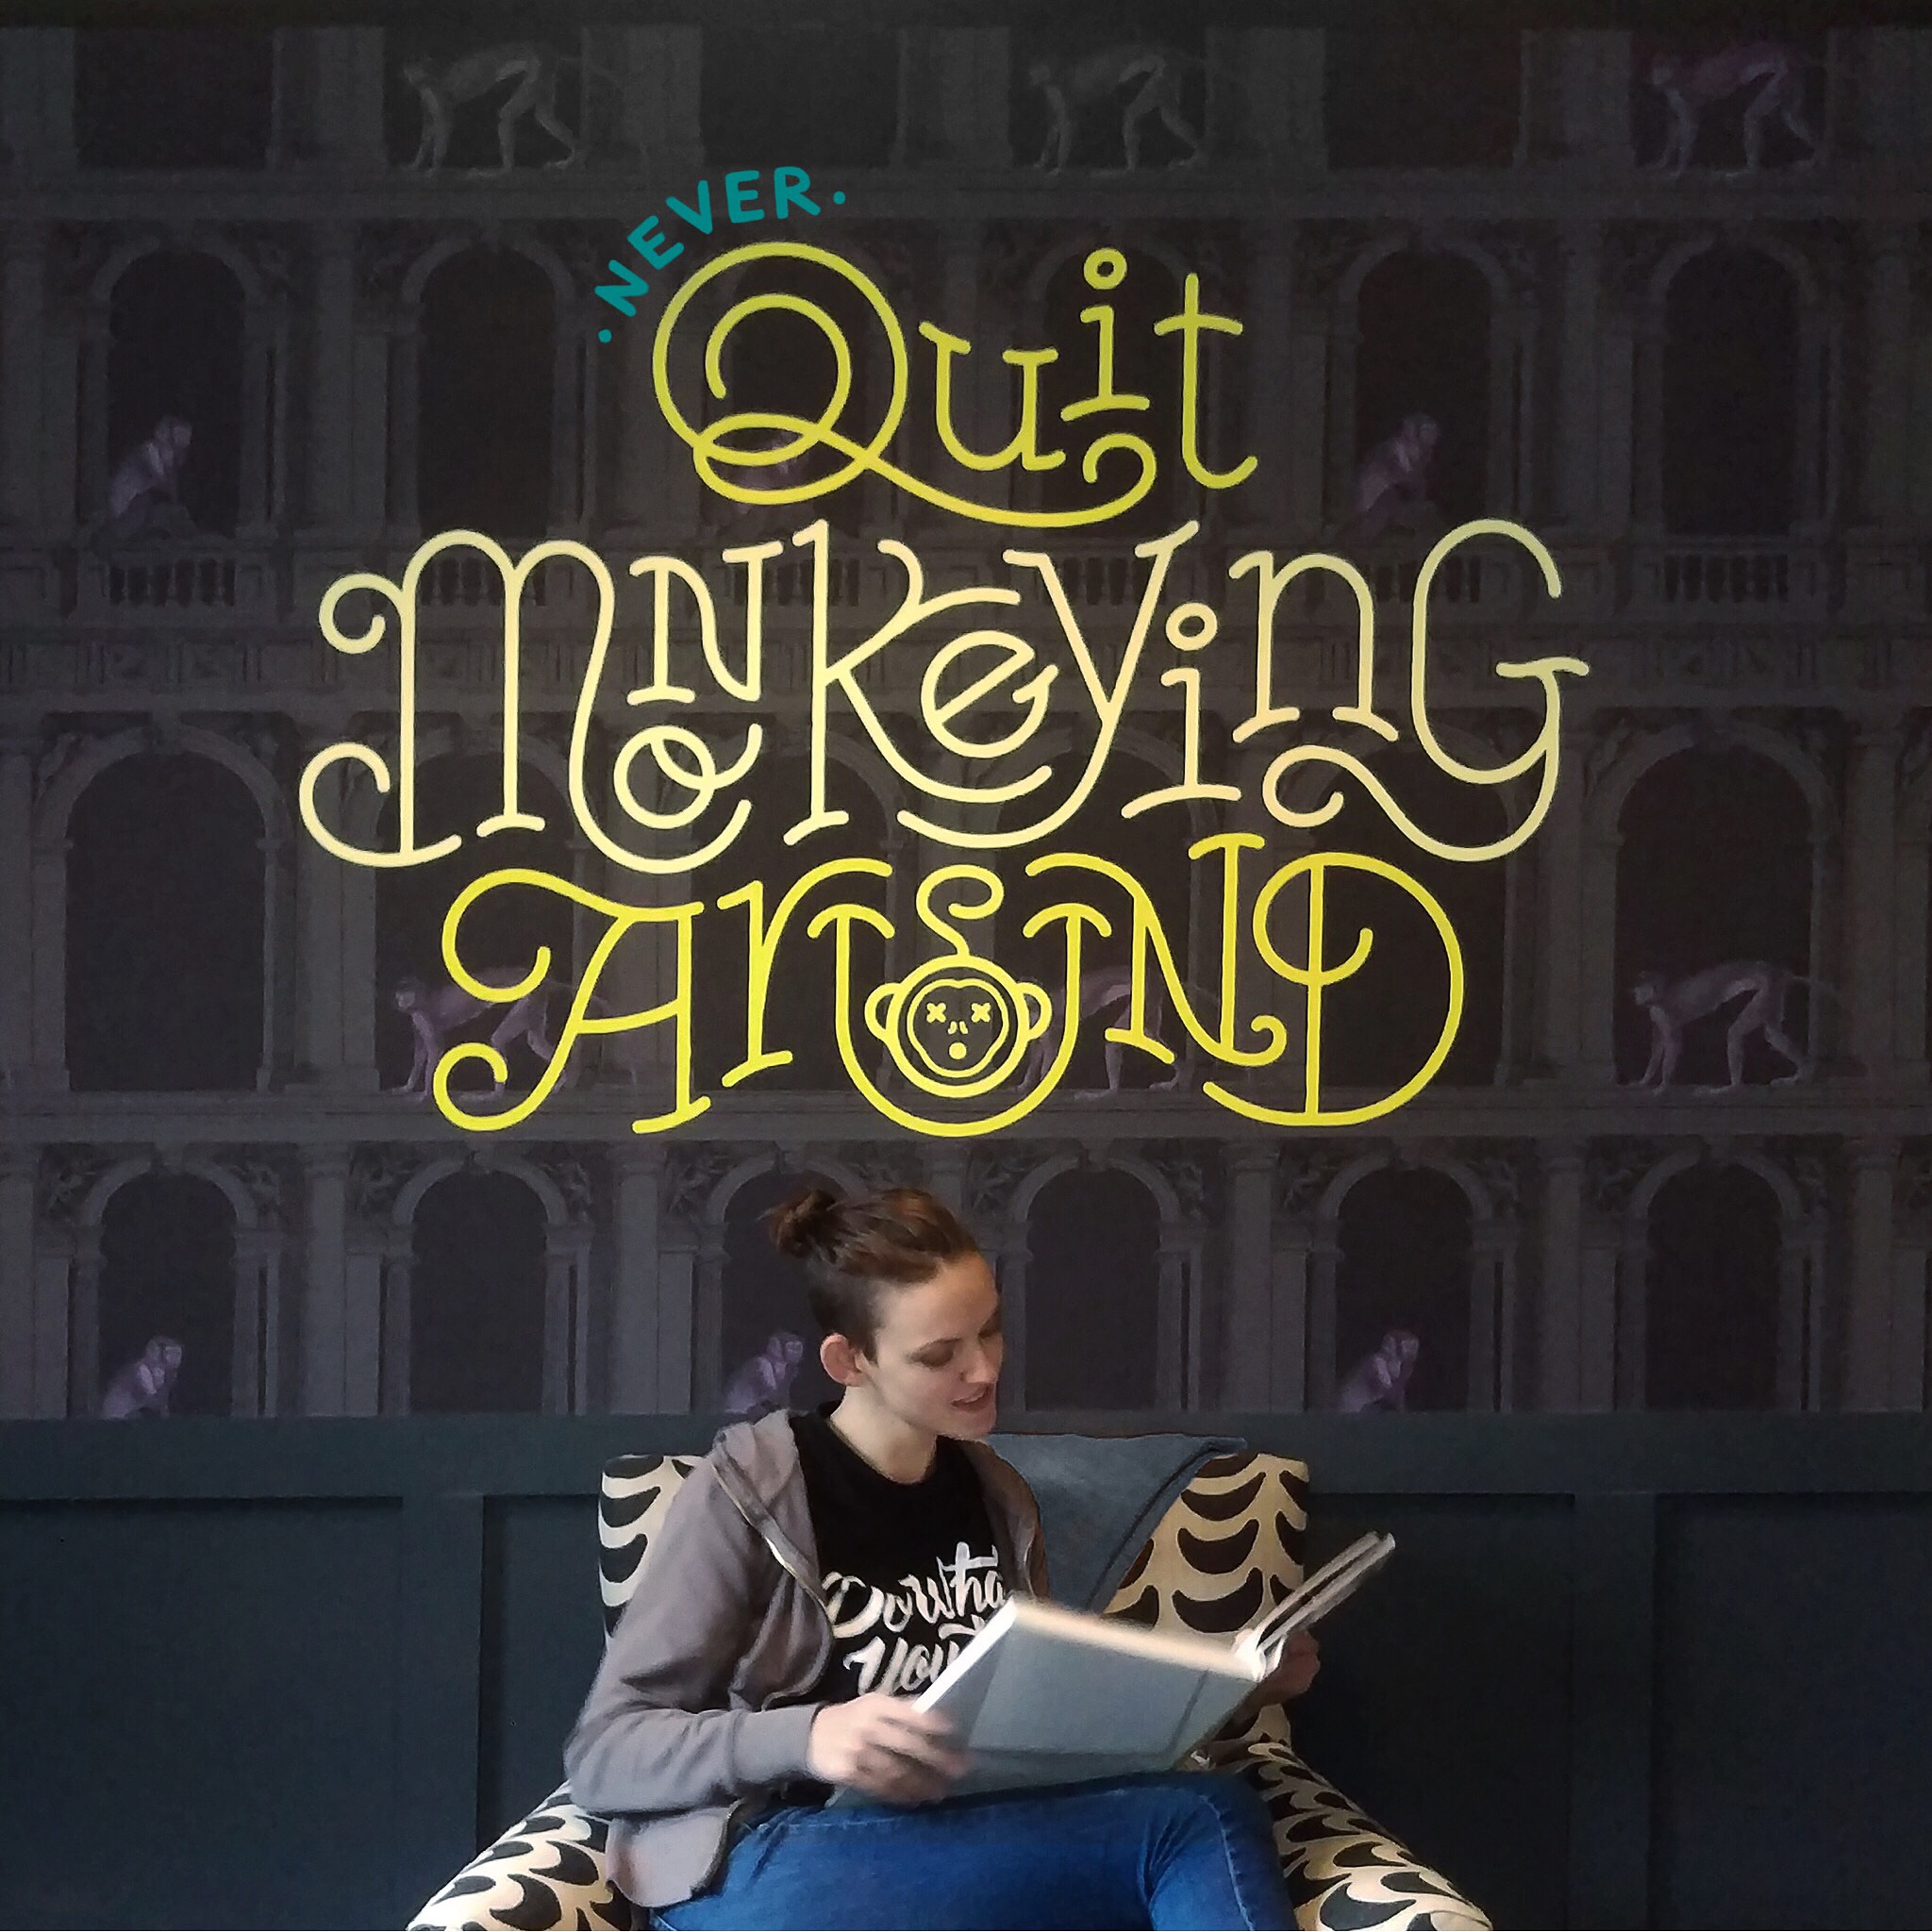 Quitmonkeying installation